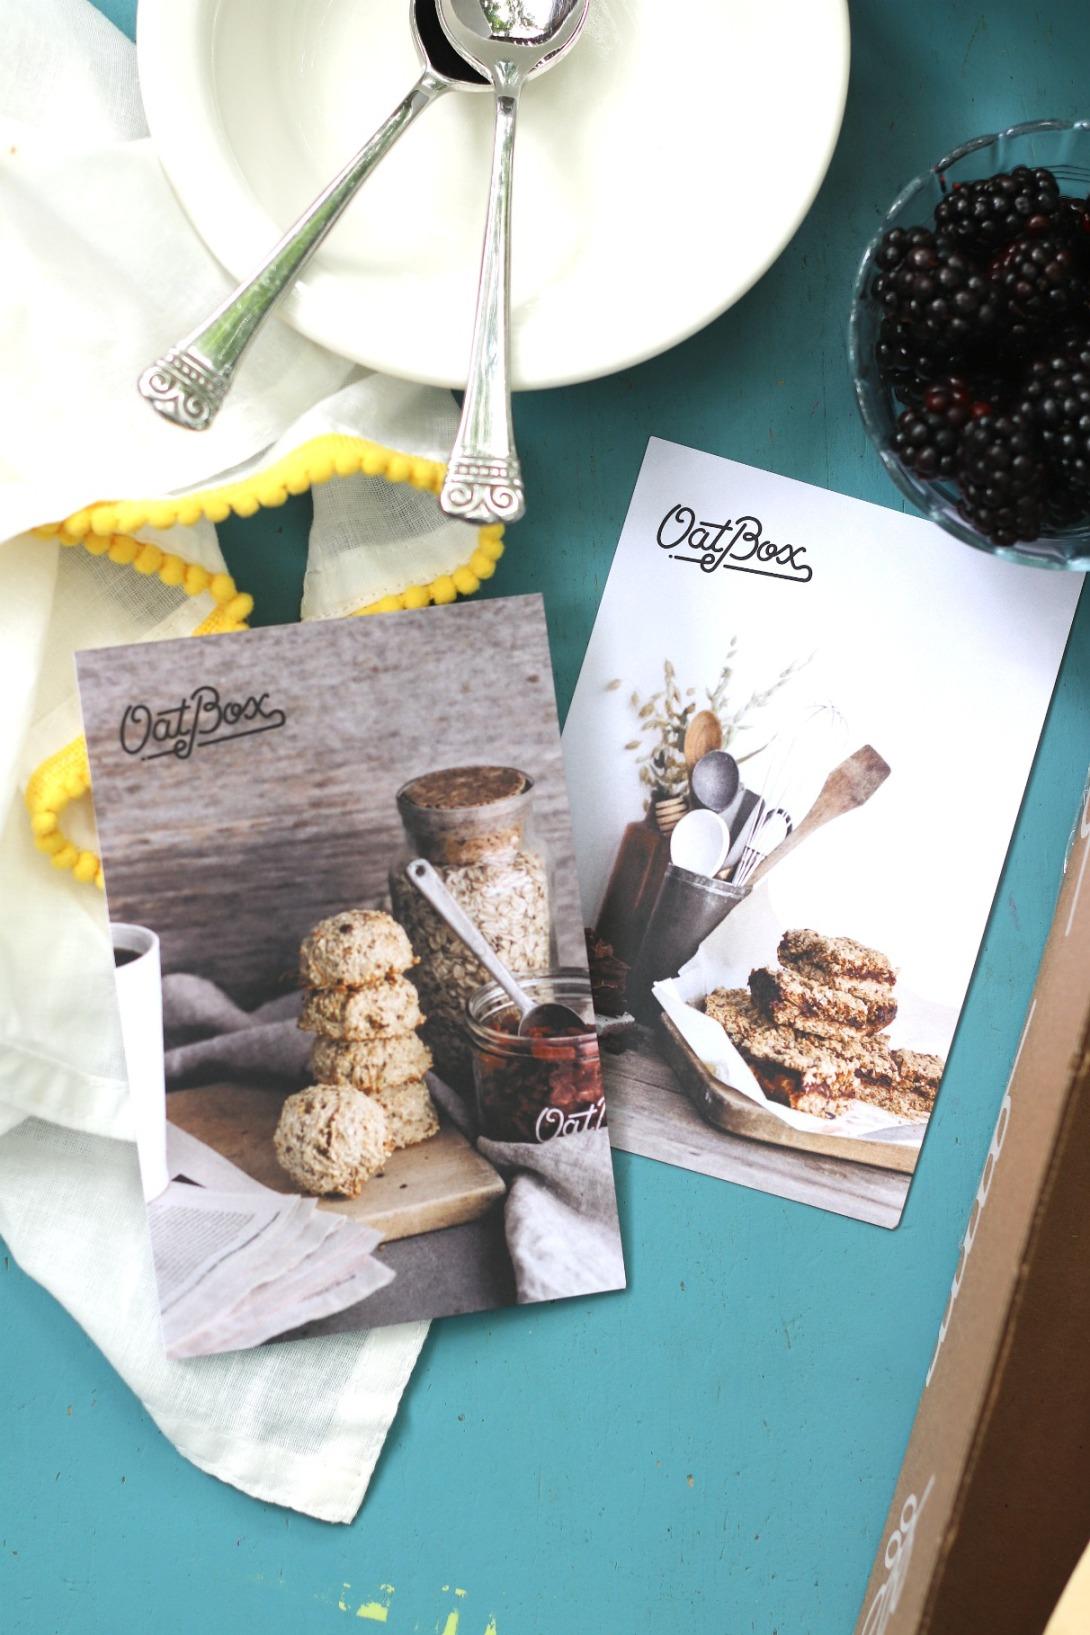 OatBox June 2019 recipe cards